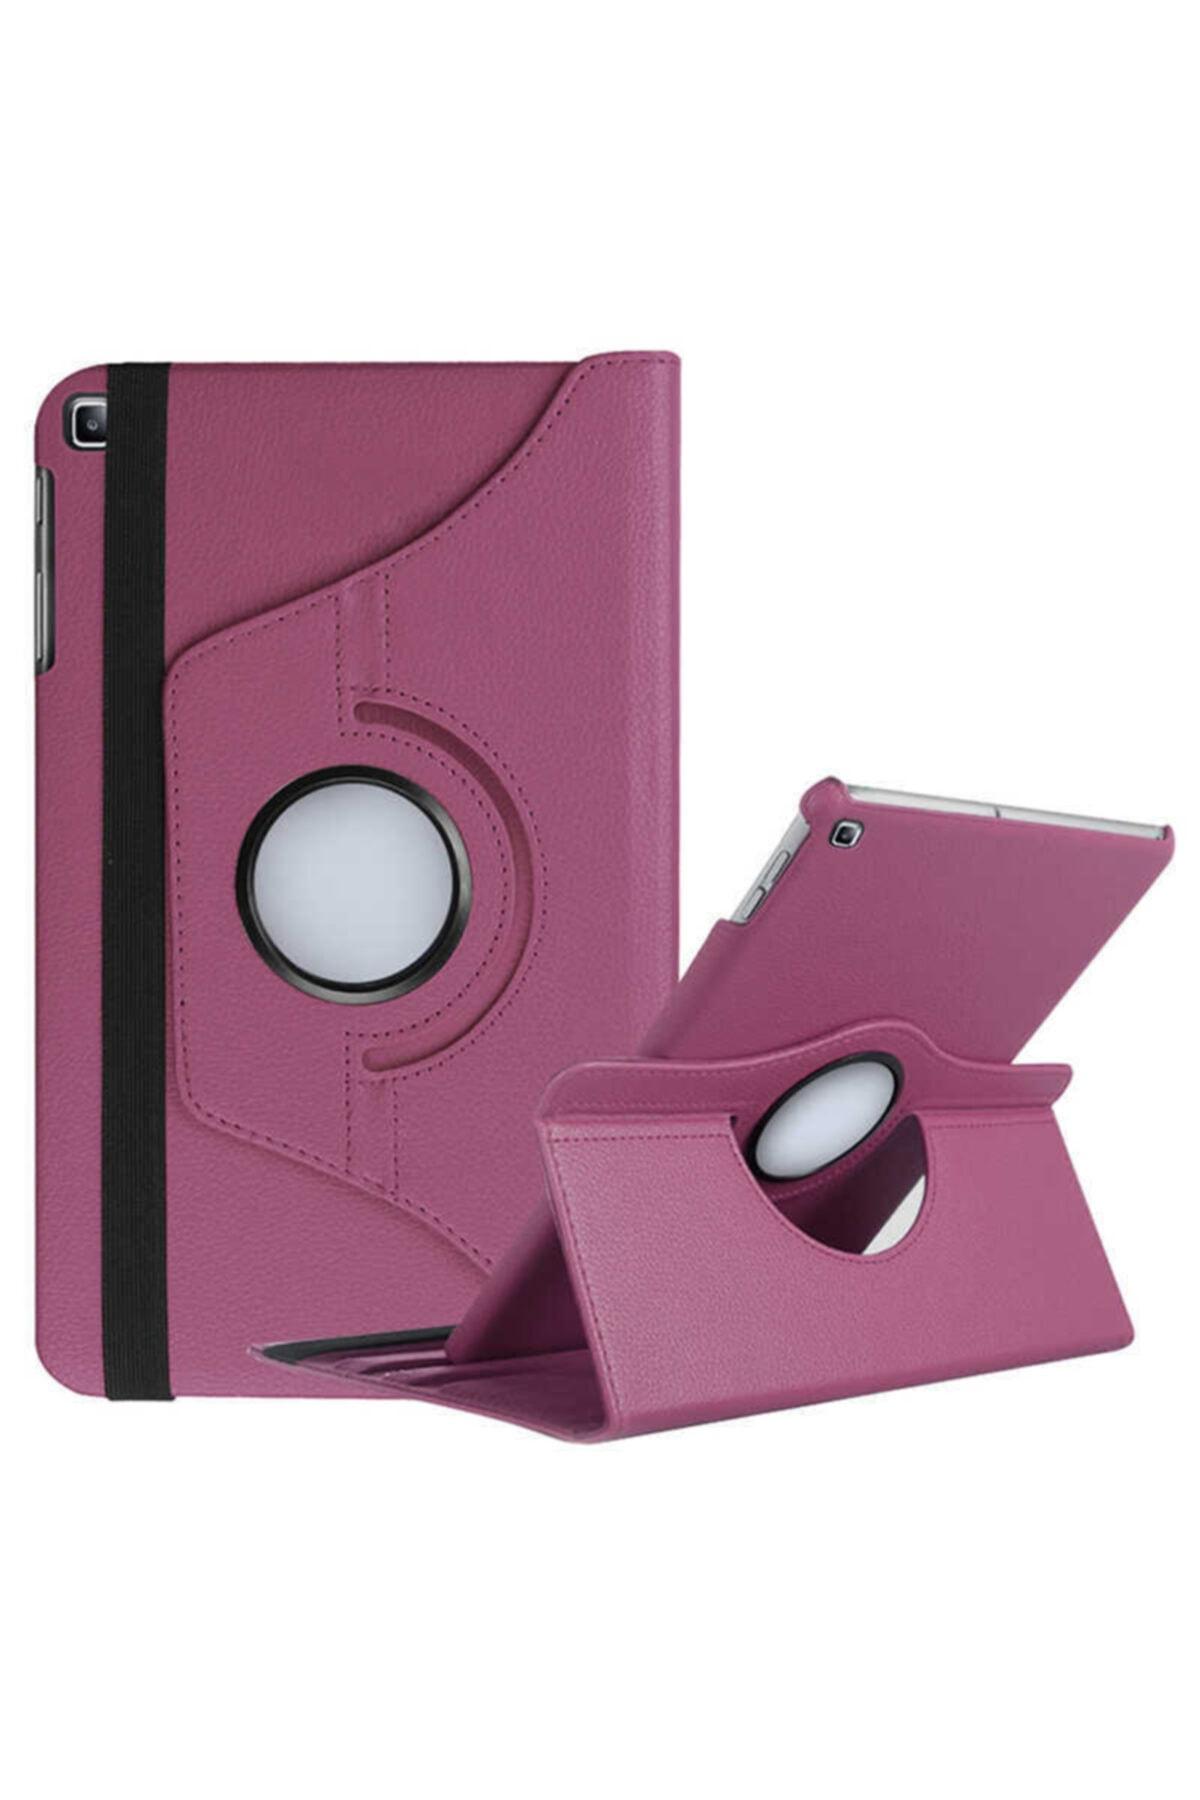 zore Galaxy Tab S6 Lite P610 Dönebilen Standlı Kılıf 1